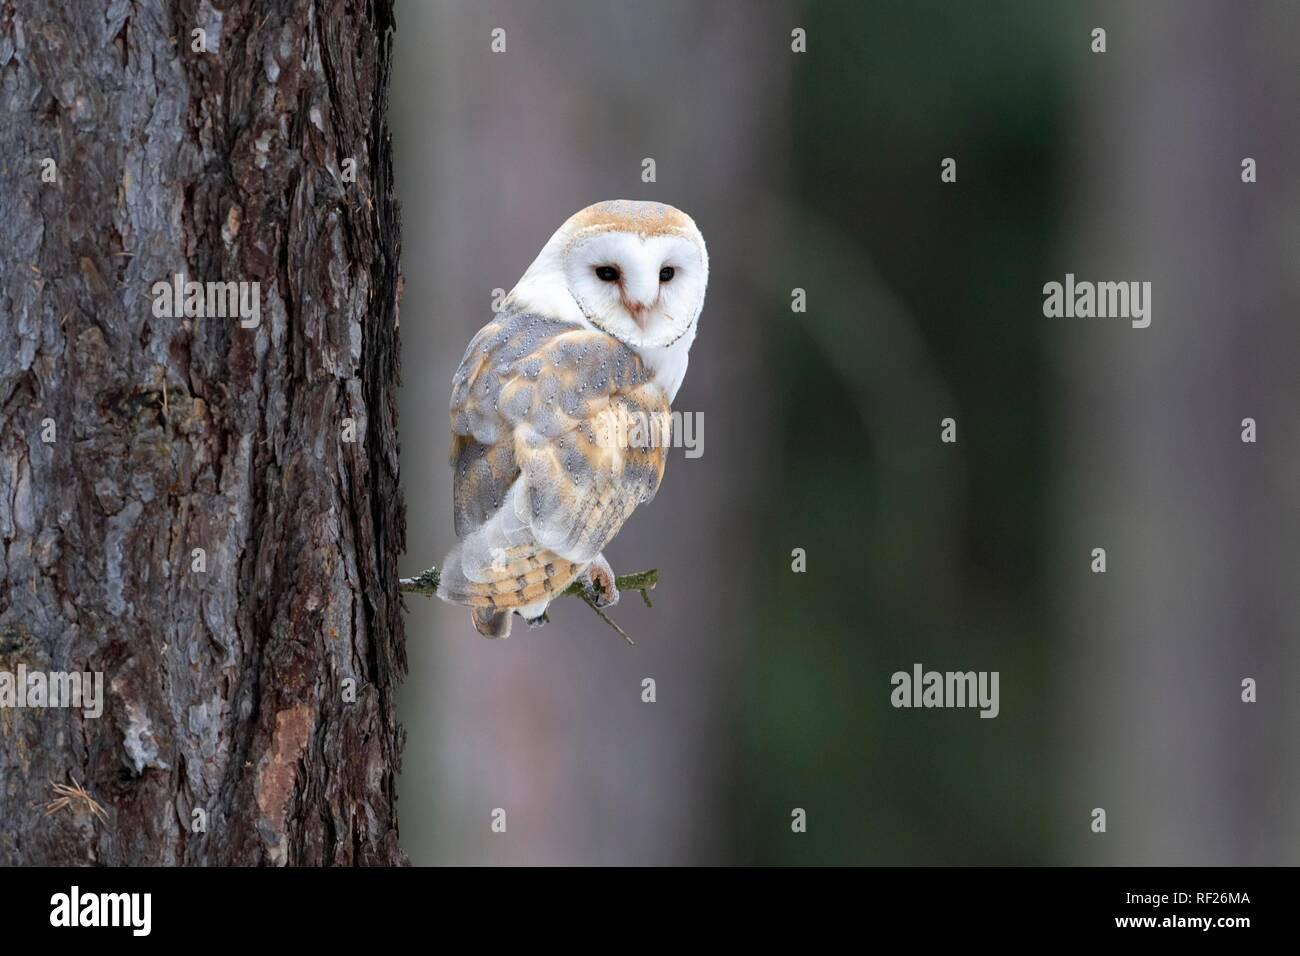 Common barn owl (Tyto alba) sits on twig, captive, Pilsen, Czech Republic - Stock Image